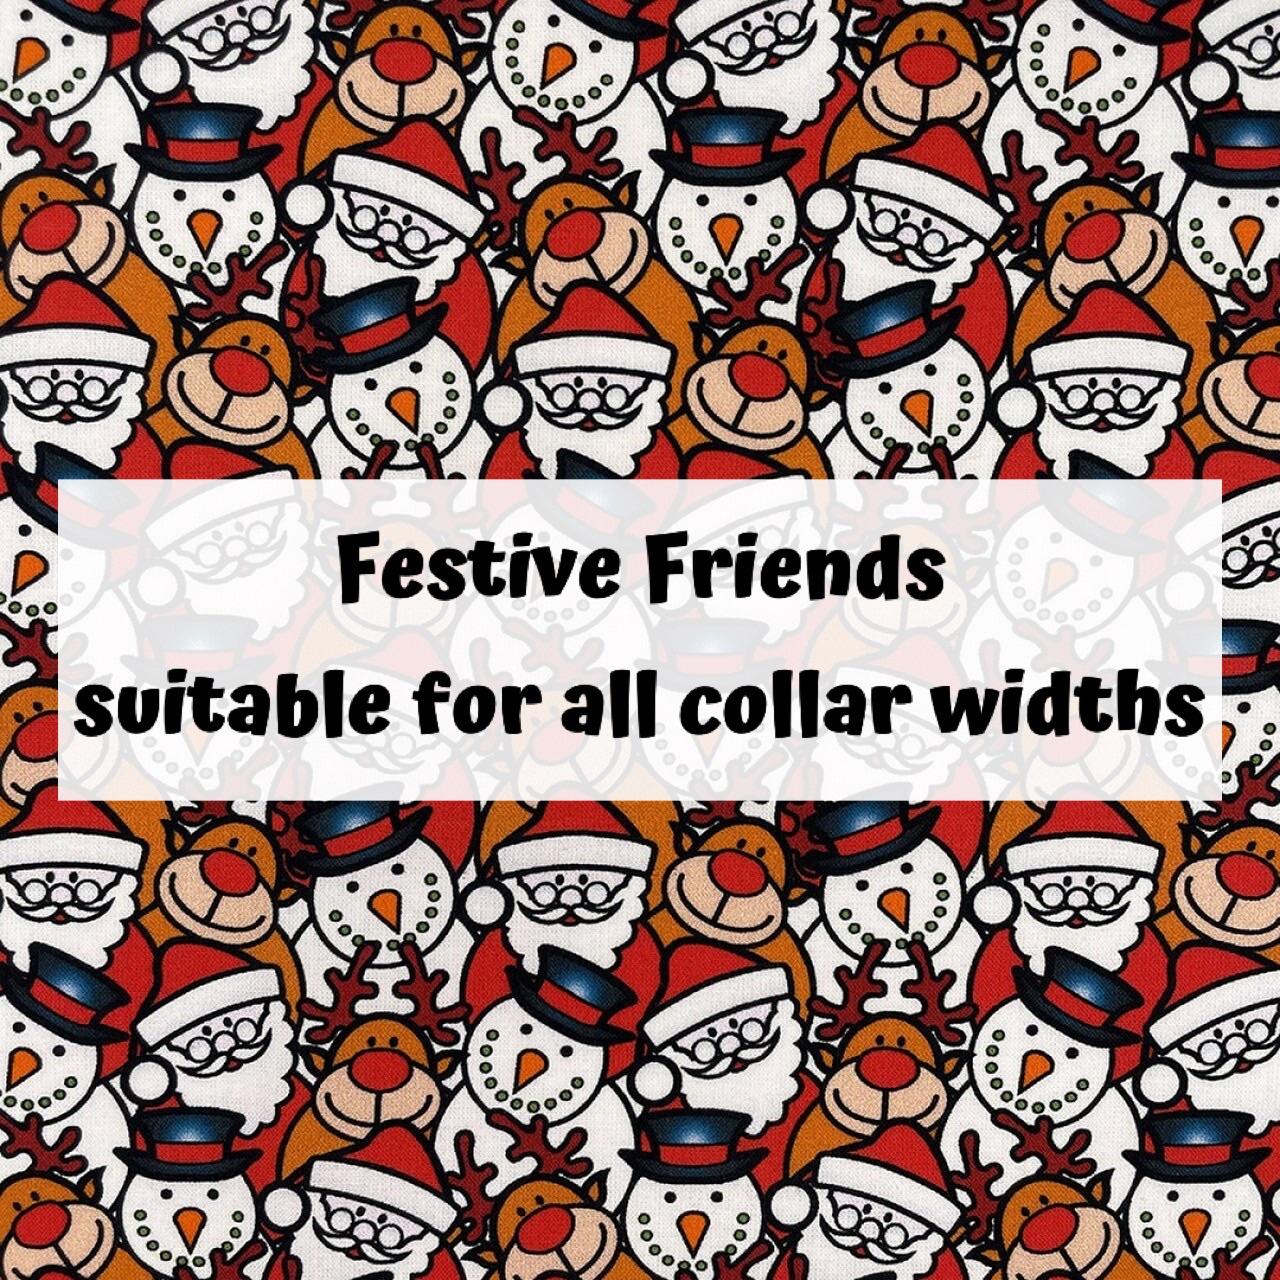 Festive Friends